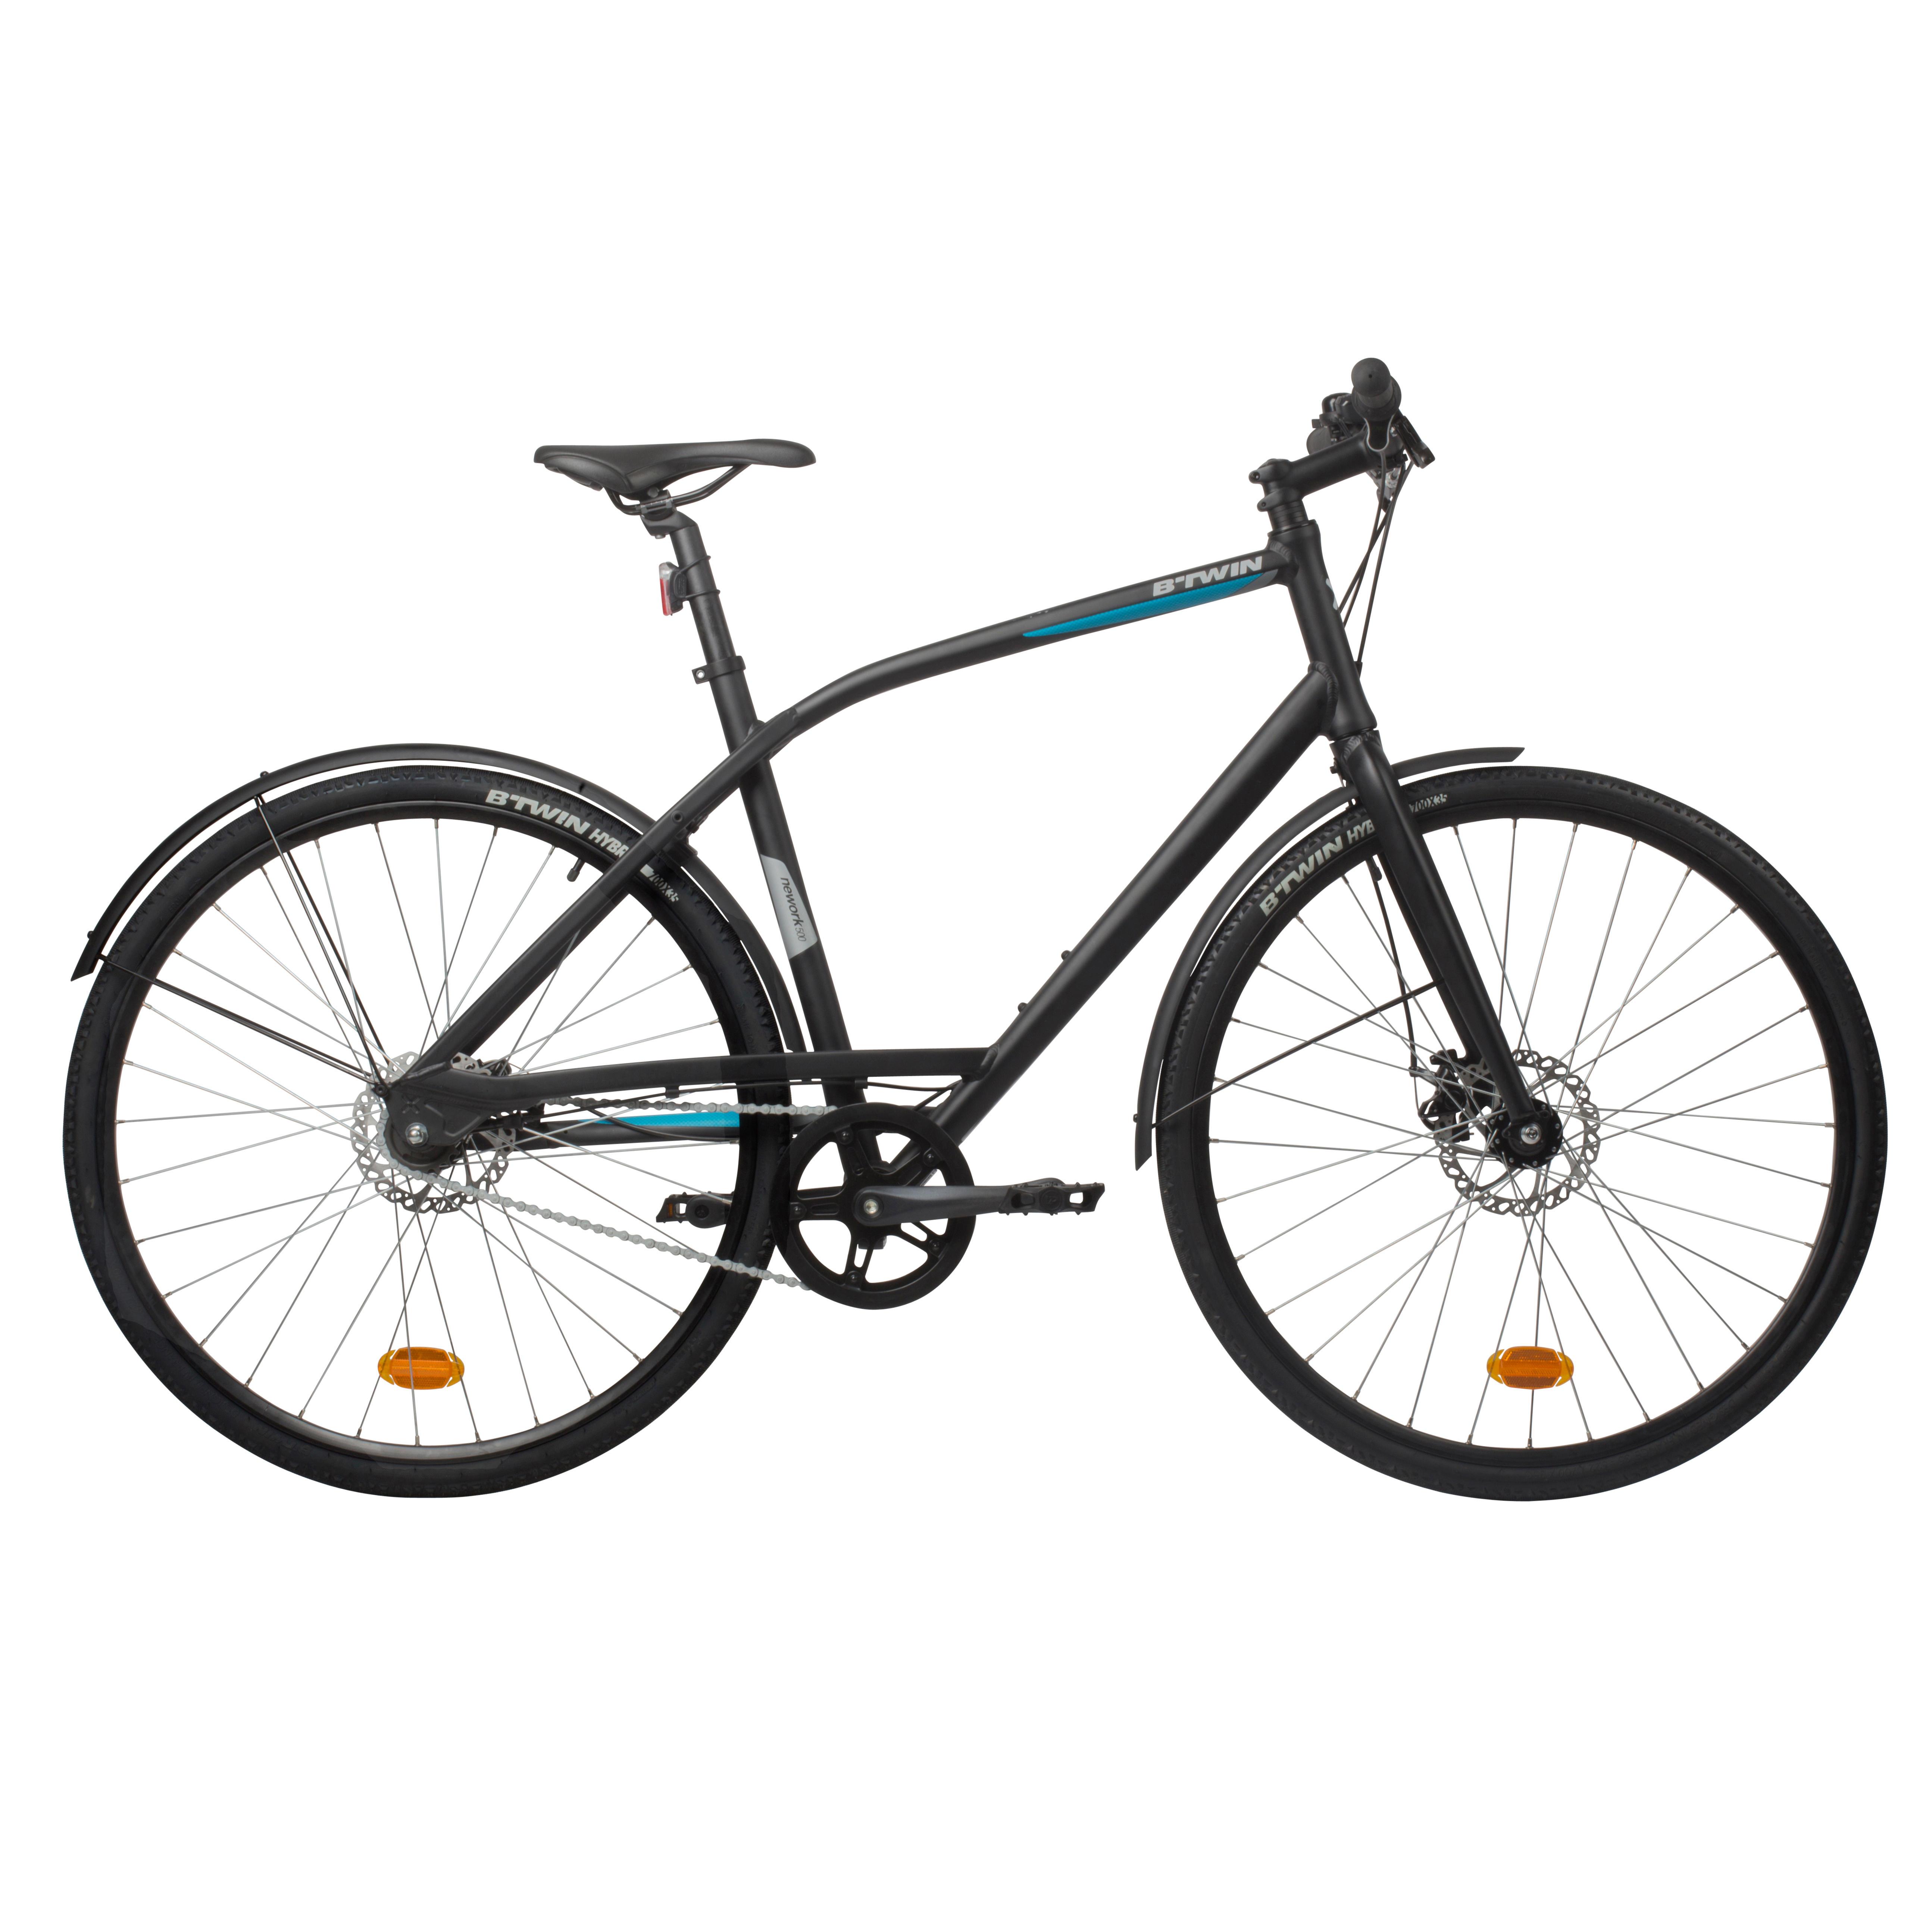 B'twin Stadsfiets Nework 500 Limited Edition - S/M